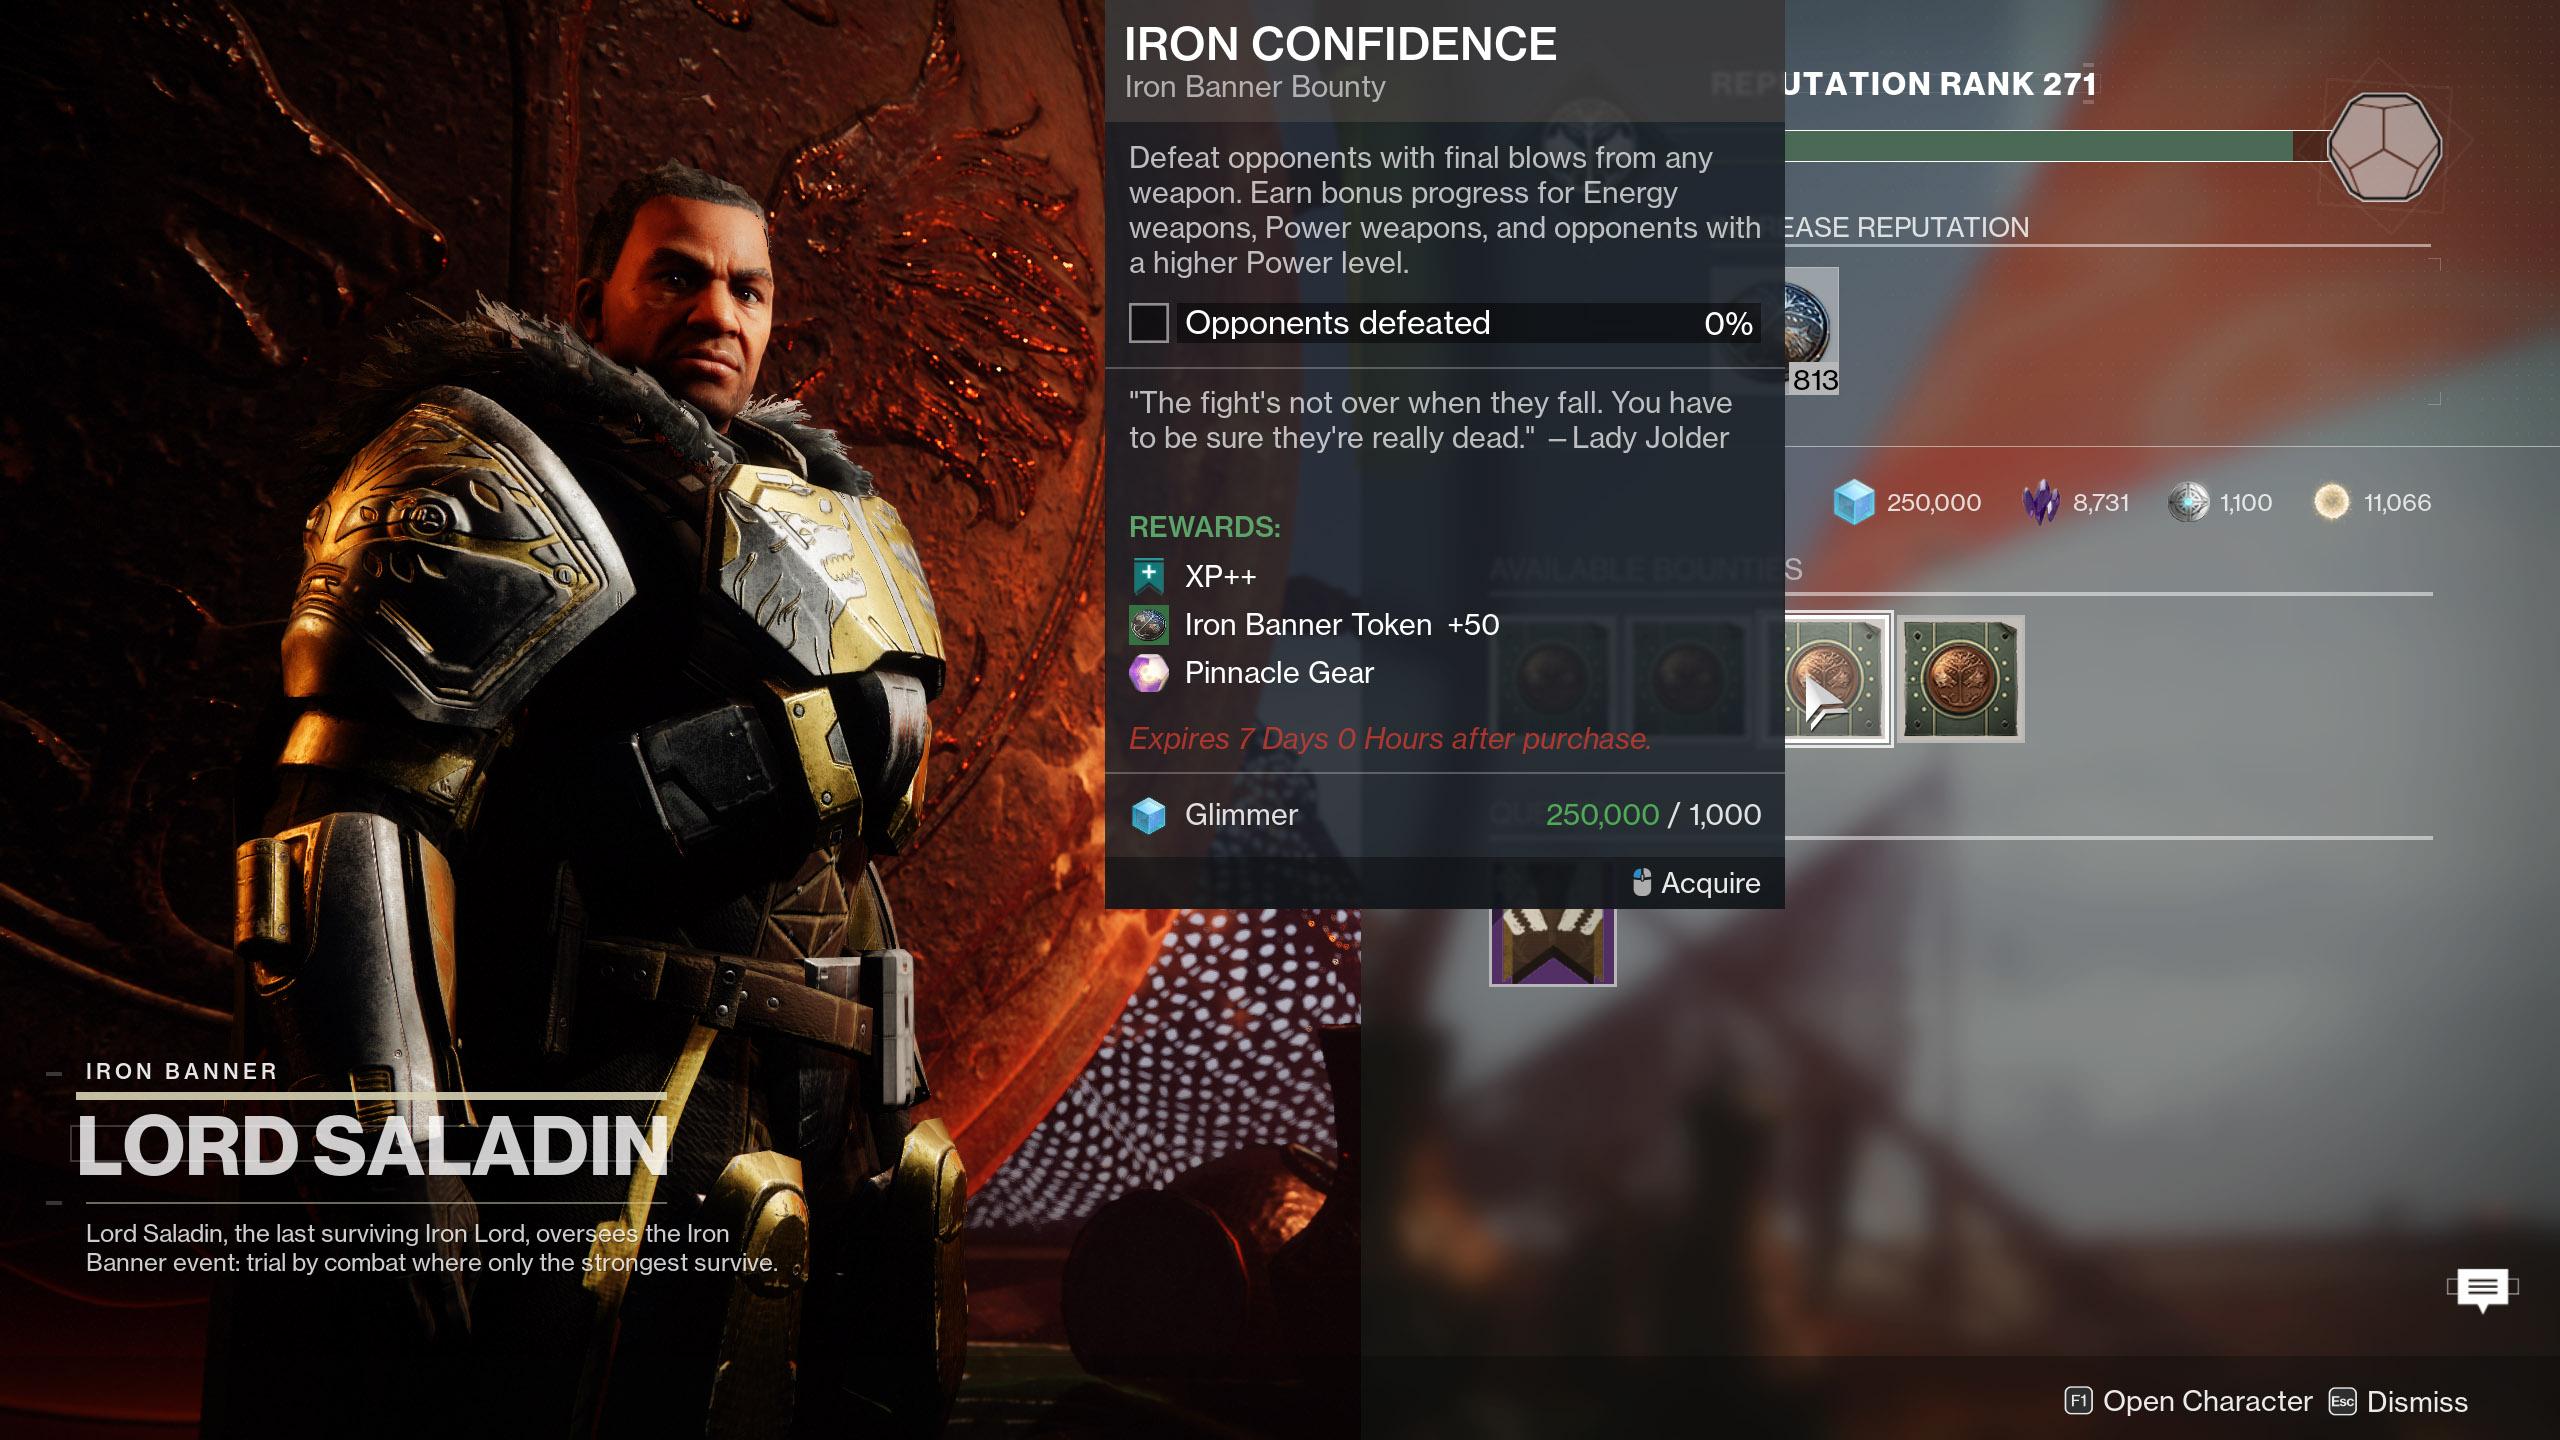 Iron Banner Season 15 Iron Confidence